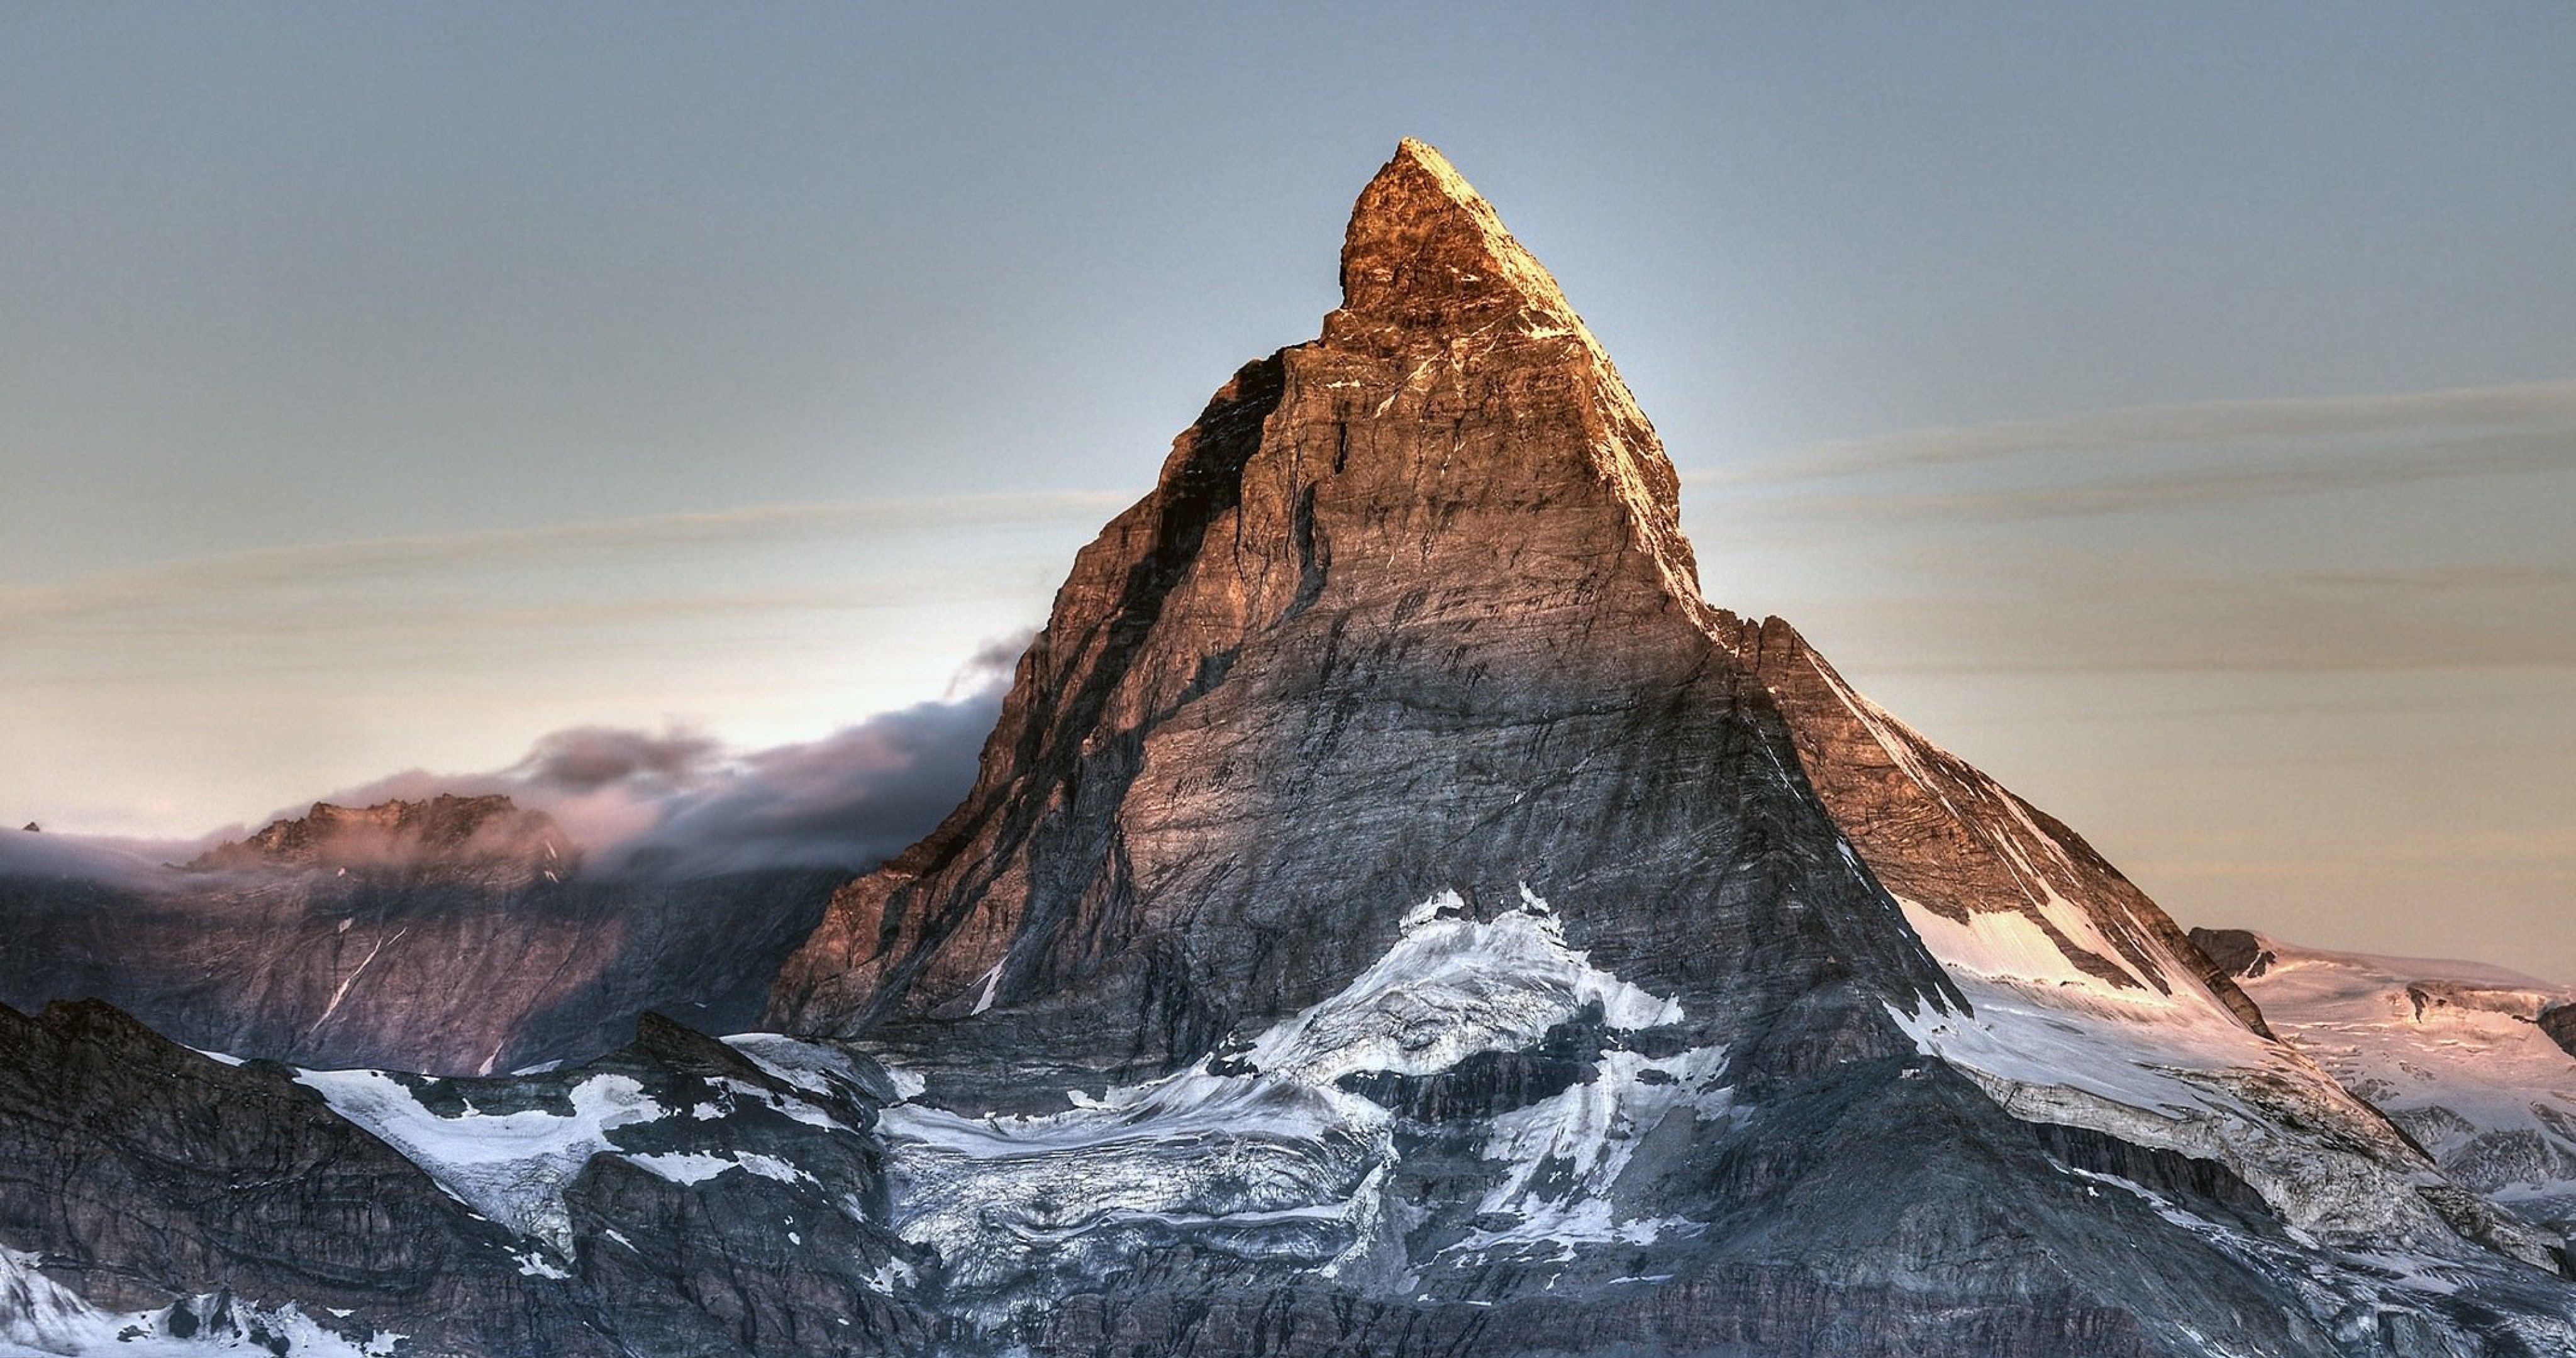 Mount Pilatus Goat iPhone Wallpaper HD Free Download